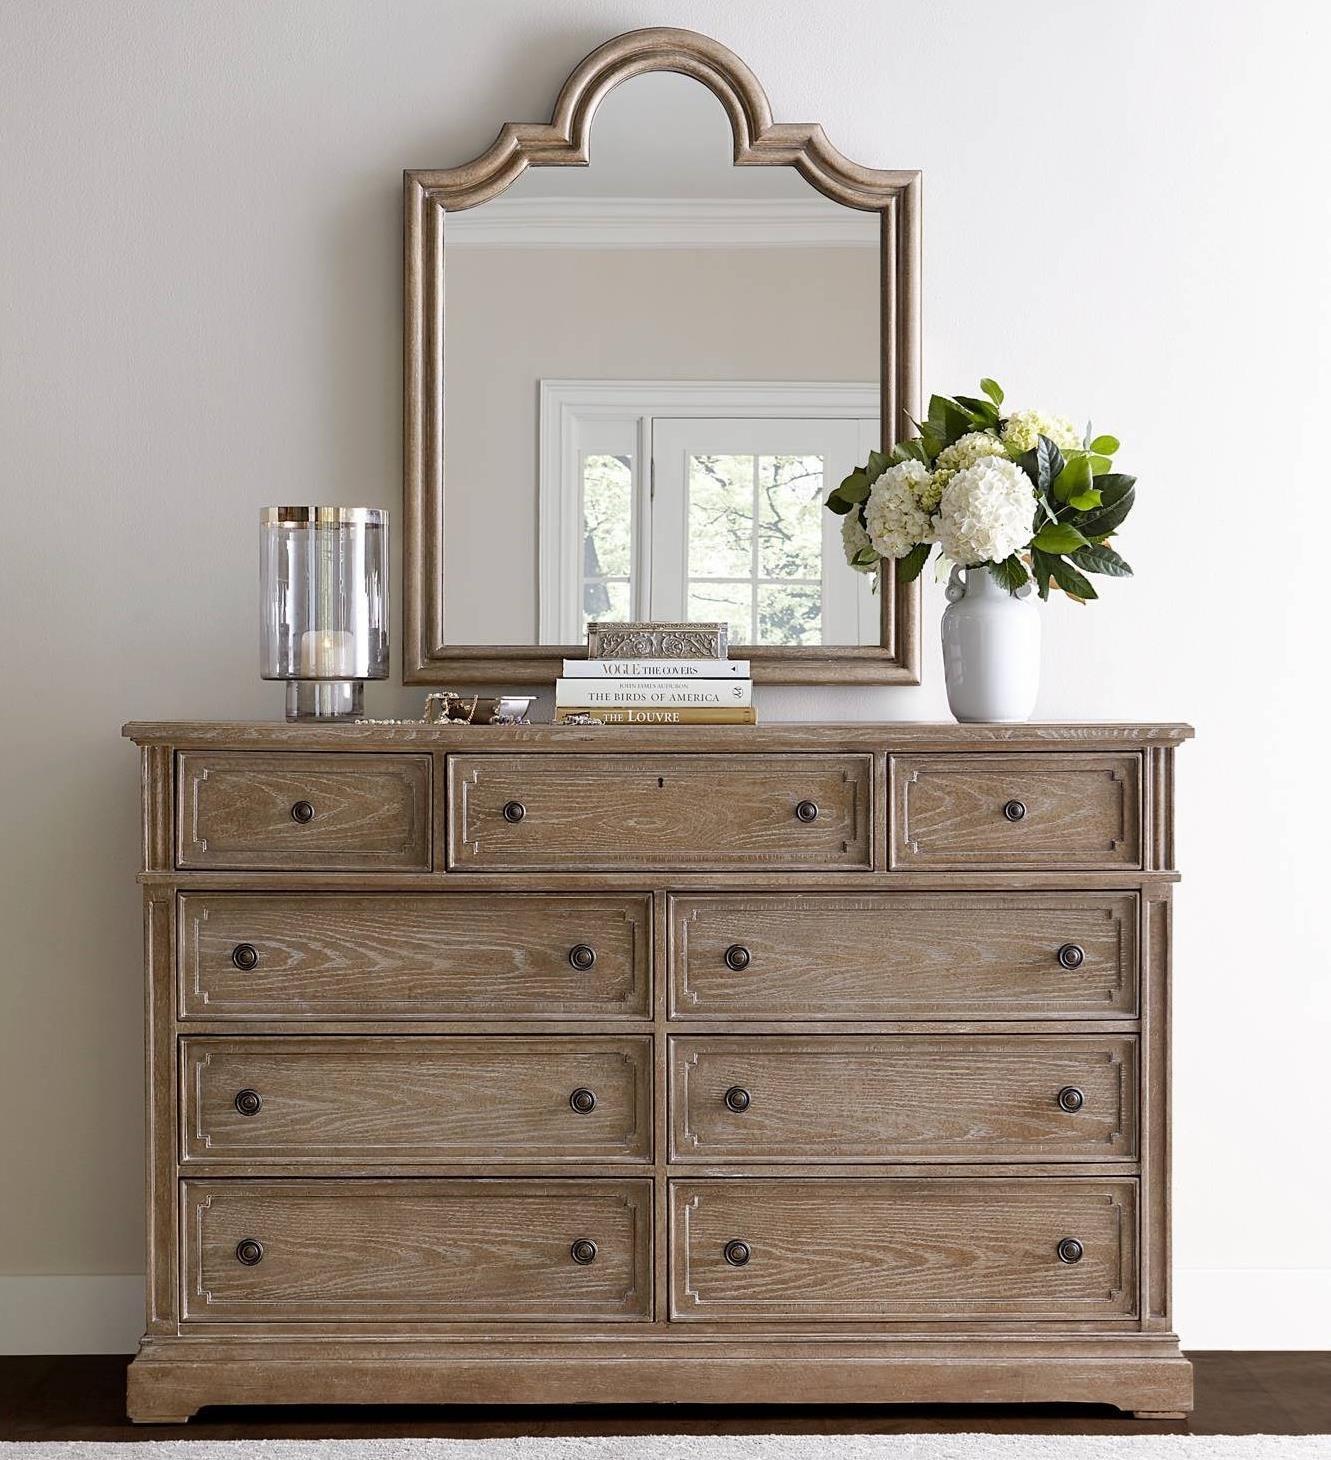 Stanley furniture wethersfield estate dresser with flip down drawer mirror belfort furniture for Stanley furniture bedroom set